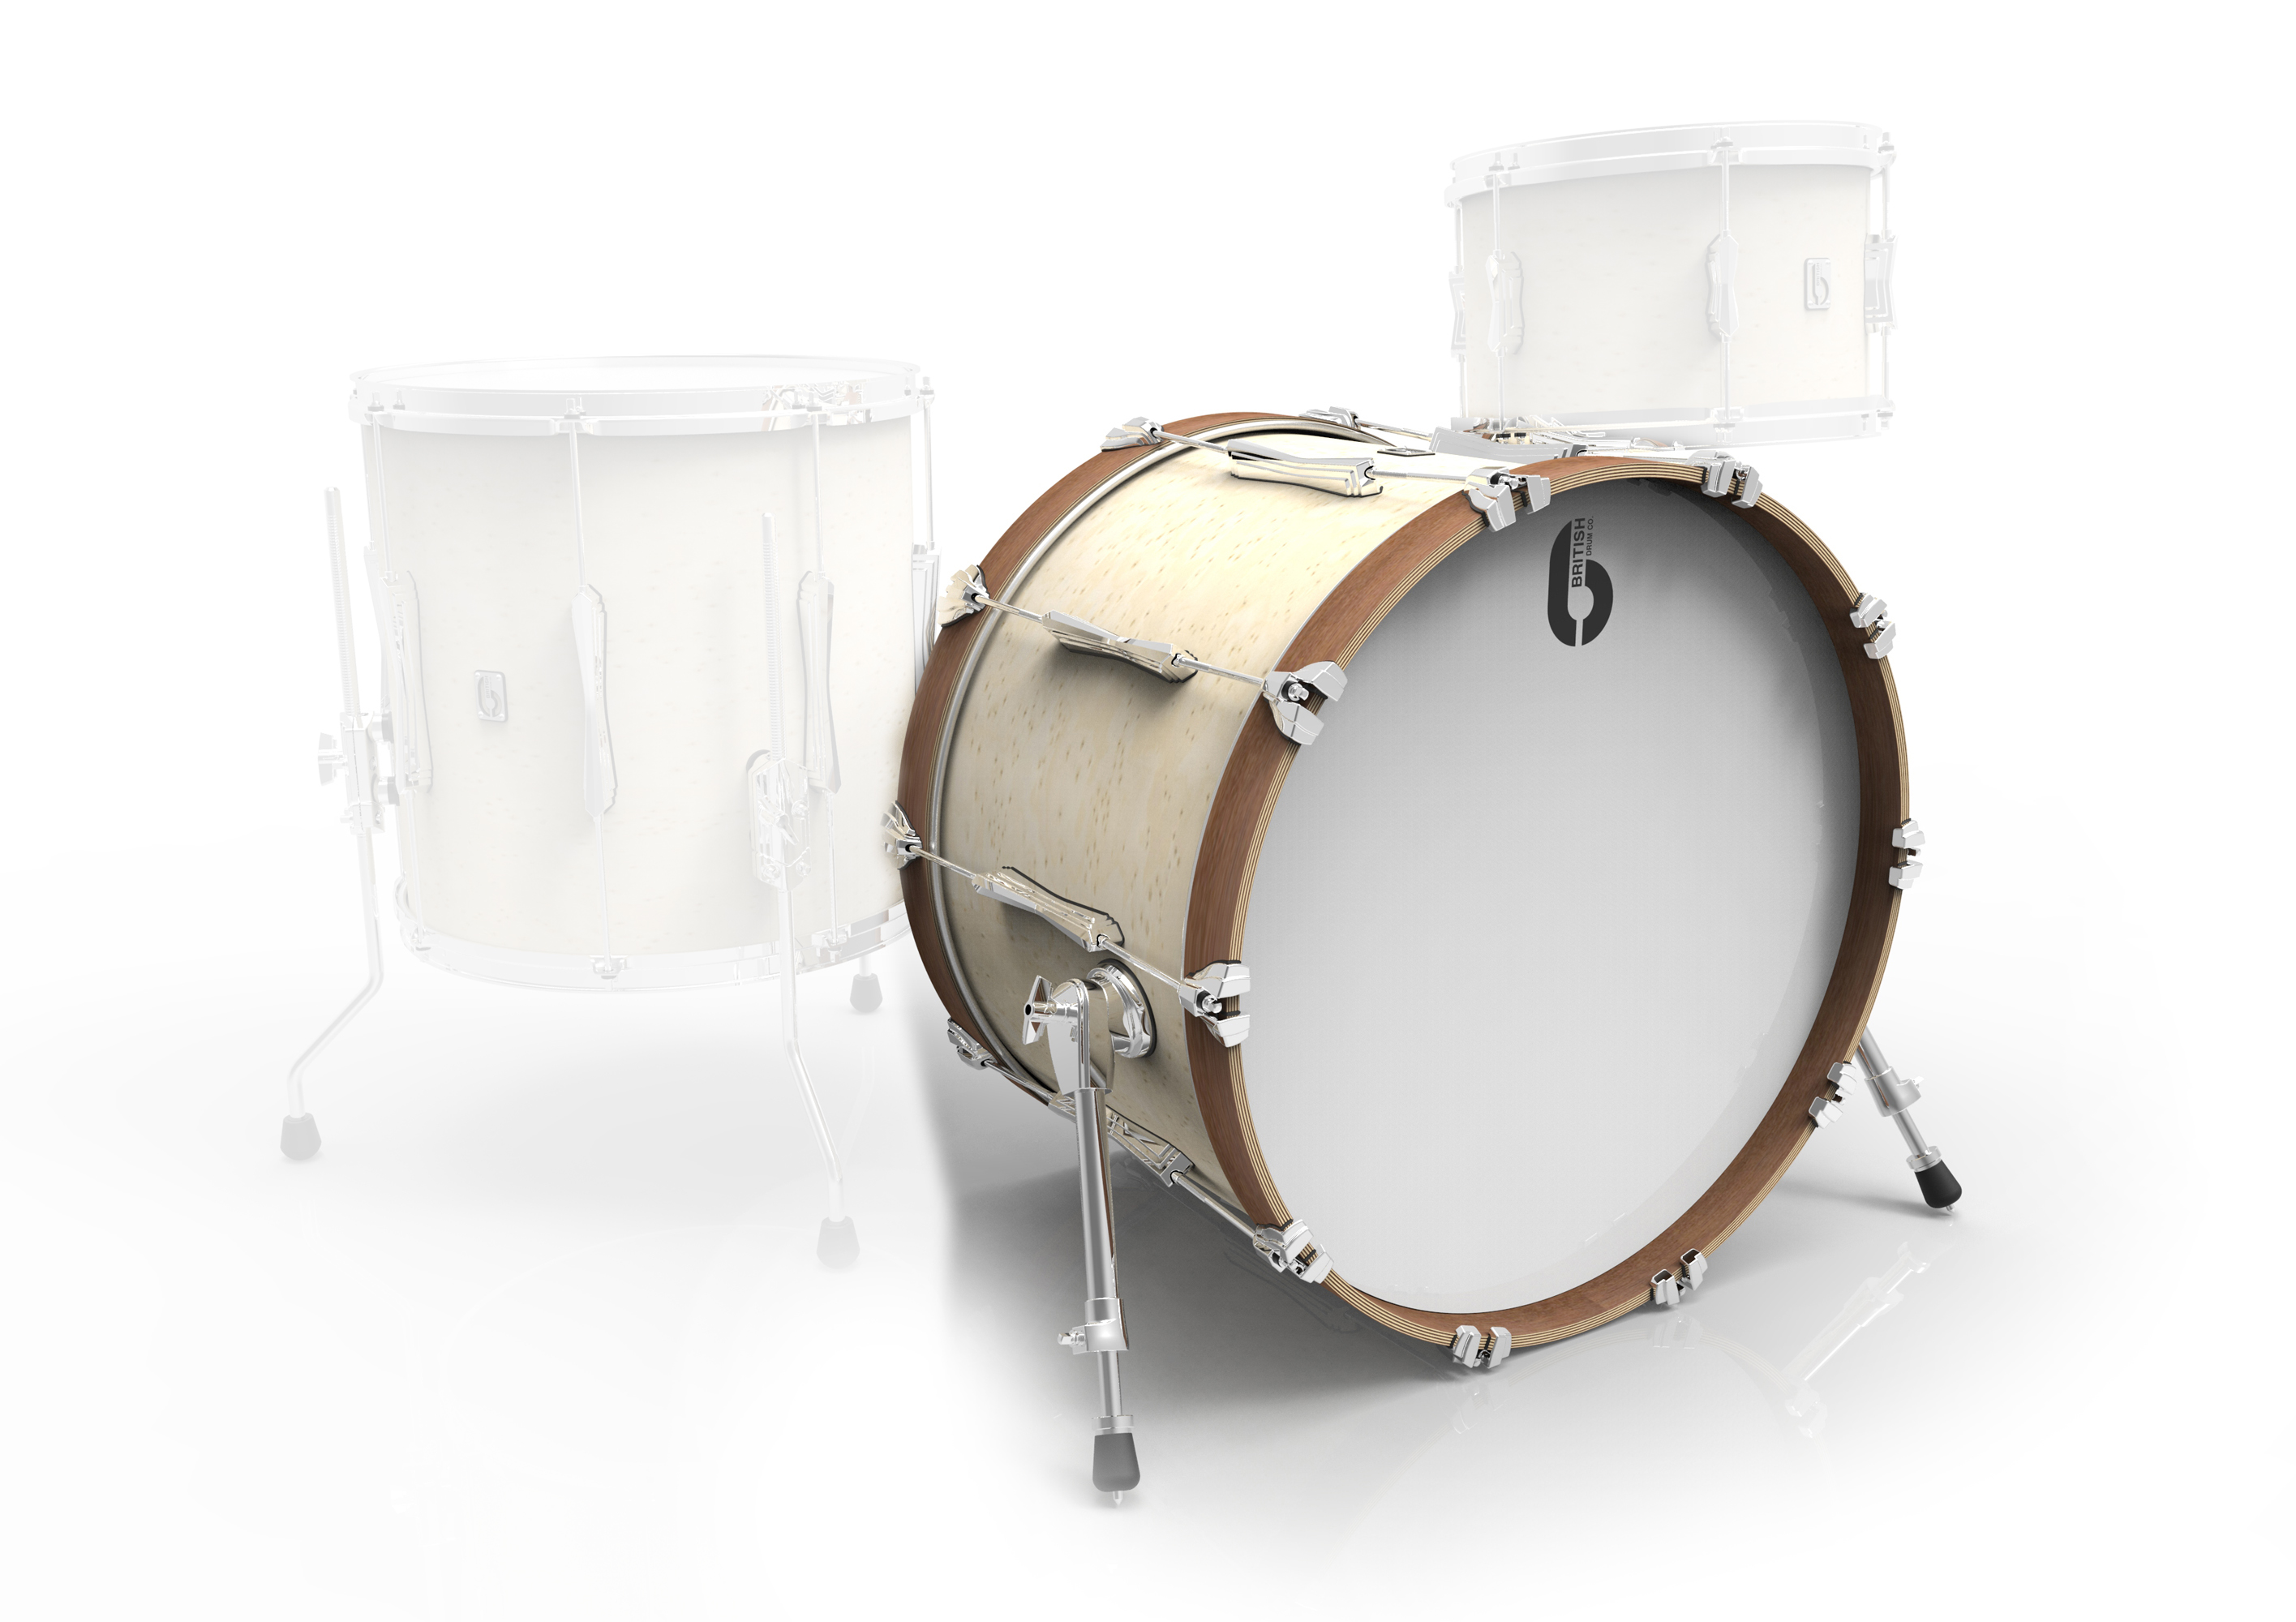 BDC Lounge Bass Drum 22x 14